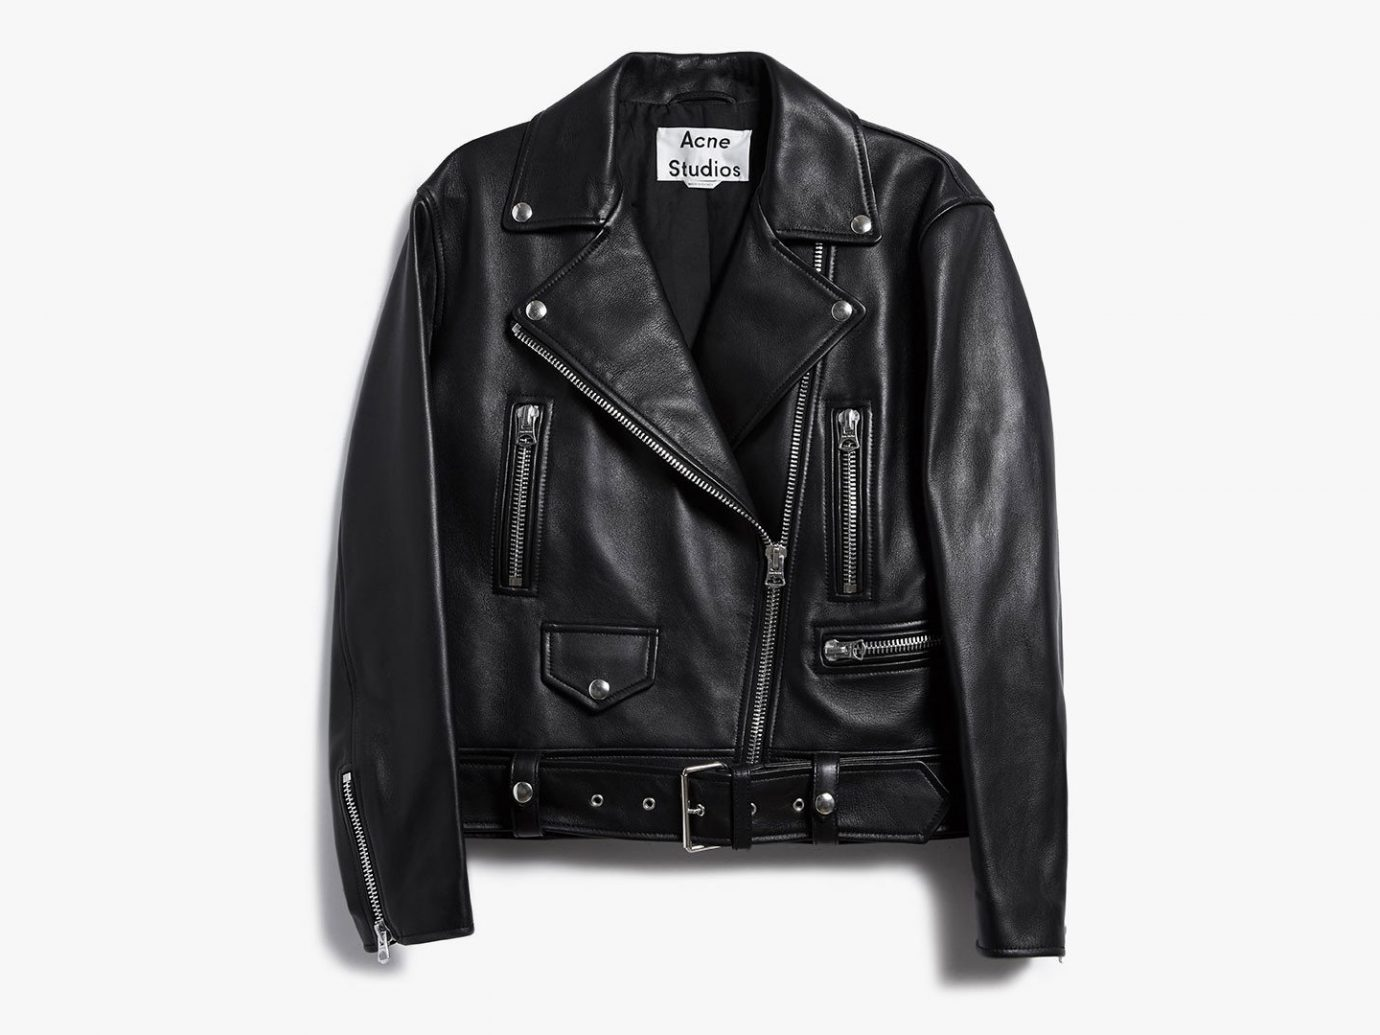 Packing Tips Style + Design Travel Shop jacket black leather jacket leather suit textile product material coat bag